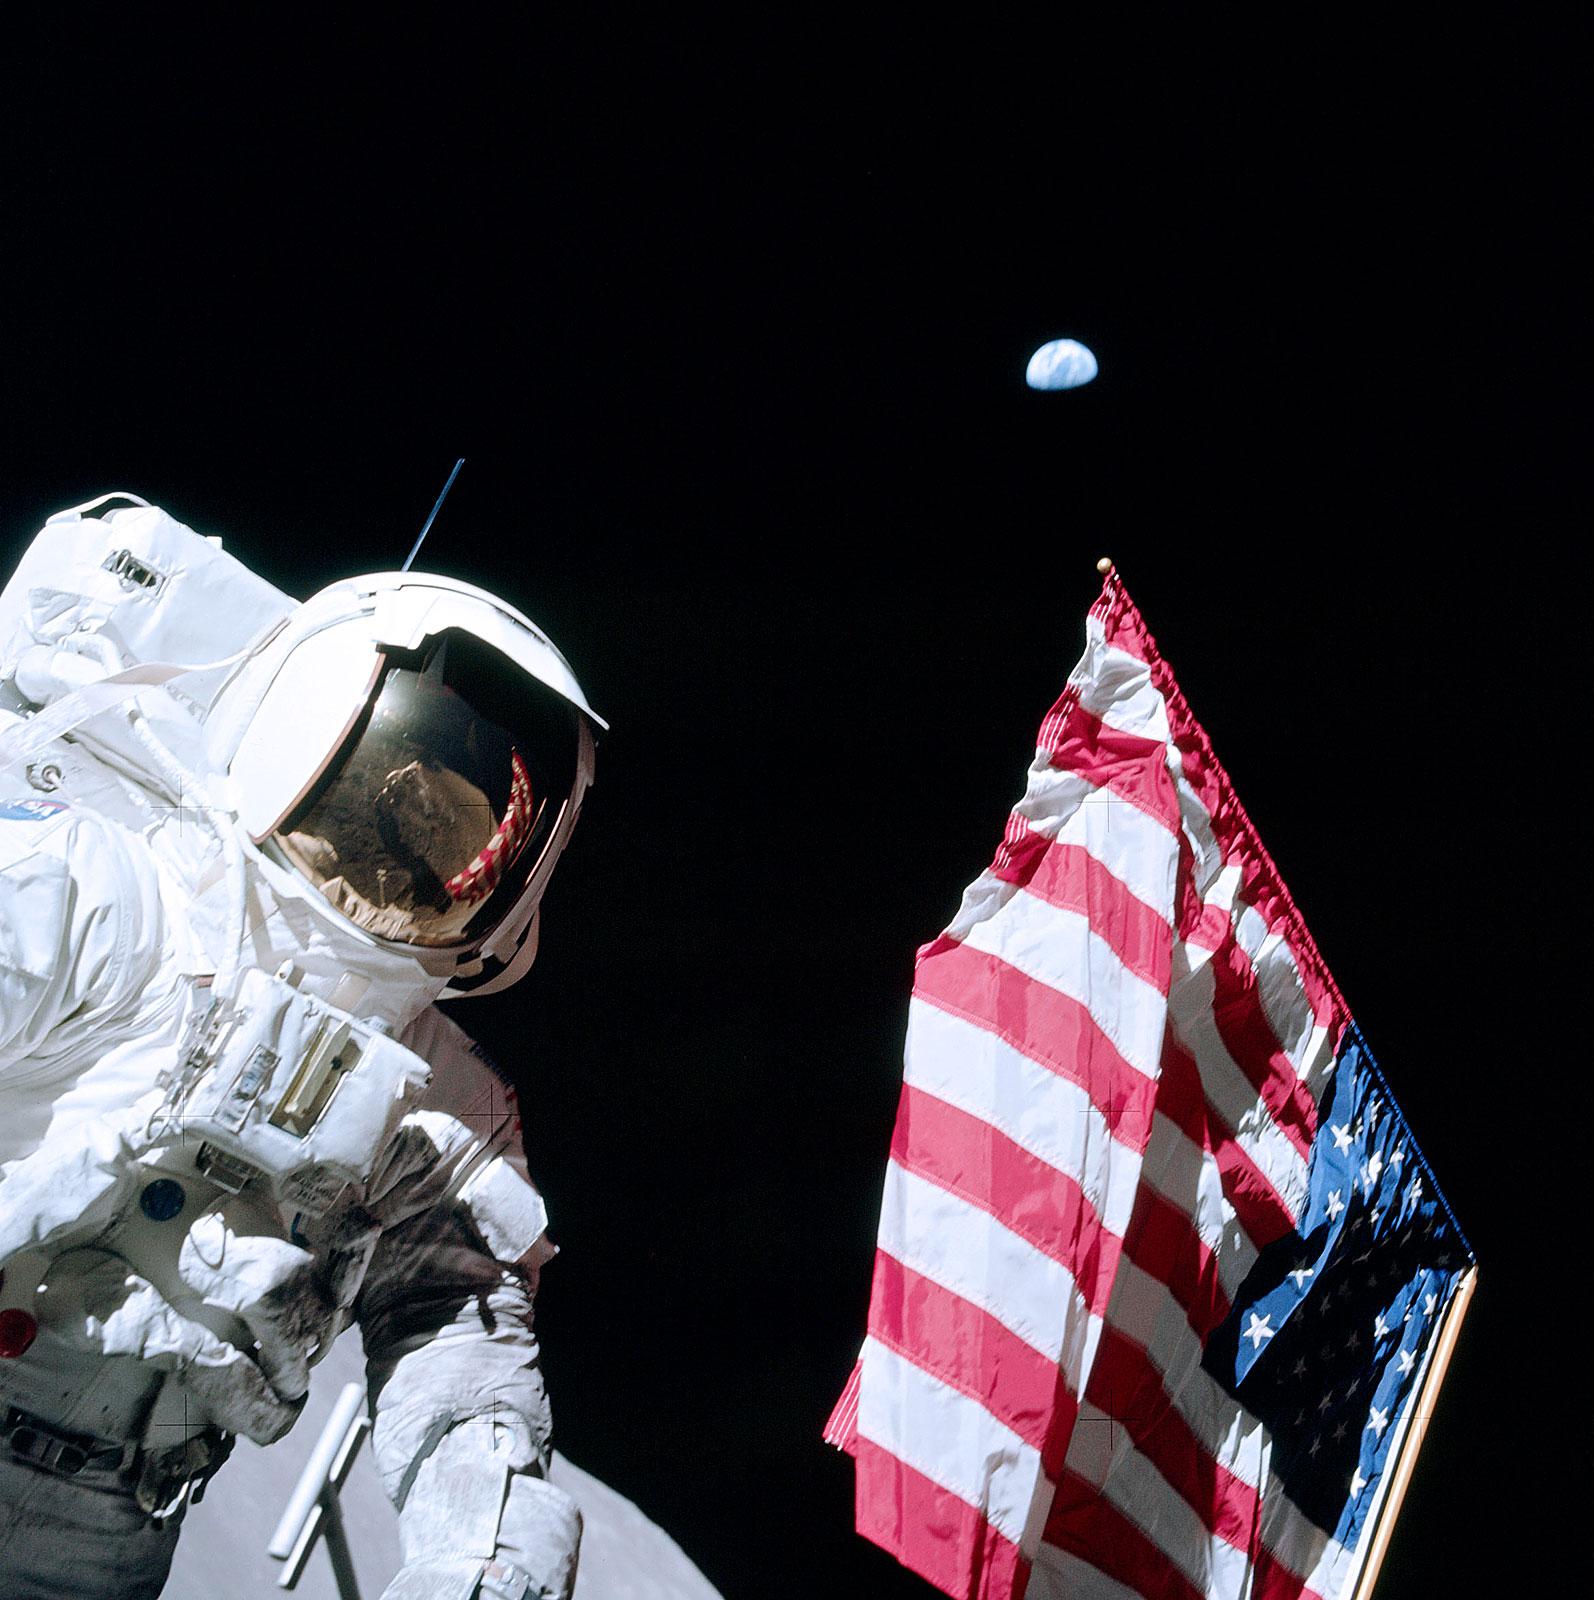 http://3.bp.blogspot.com/_04kZGR_ltmE/Ssj9_izSc8I/AAAAAAAAExA/_6MZA8gkh0A/s1600/Astronaut_Harrison_\'Jack\'_Schmitt,_American_Flag,_and_Earth_(Apollo_17_EVA-1).jpg